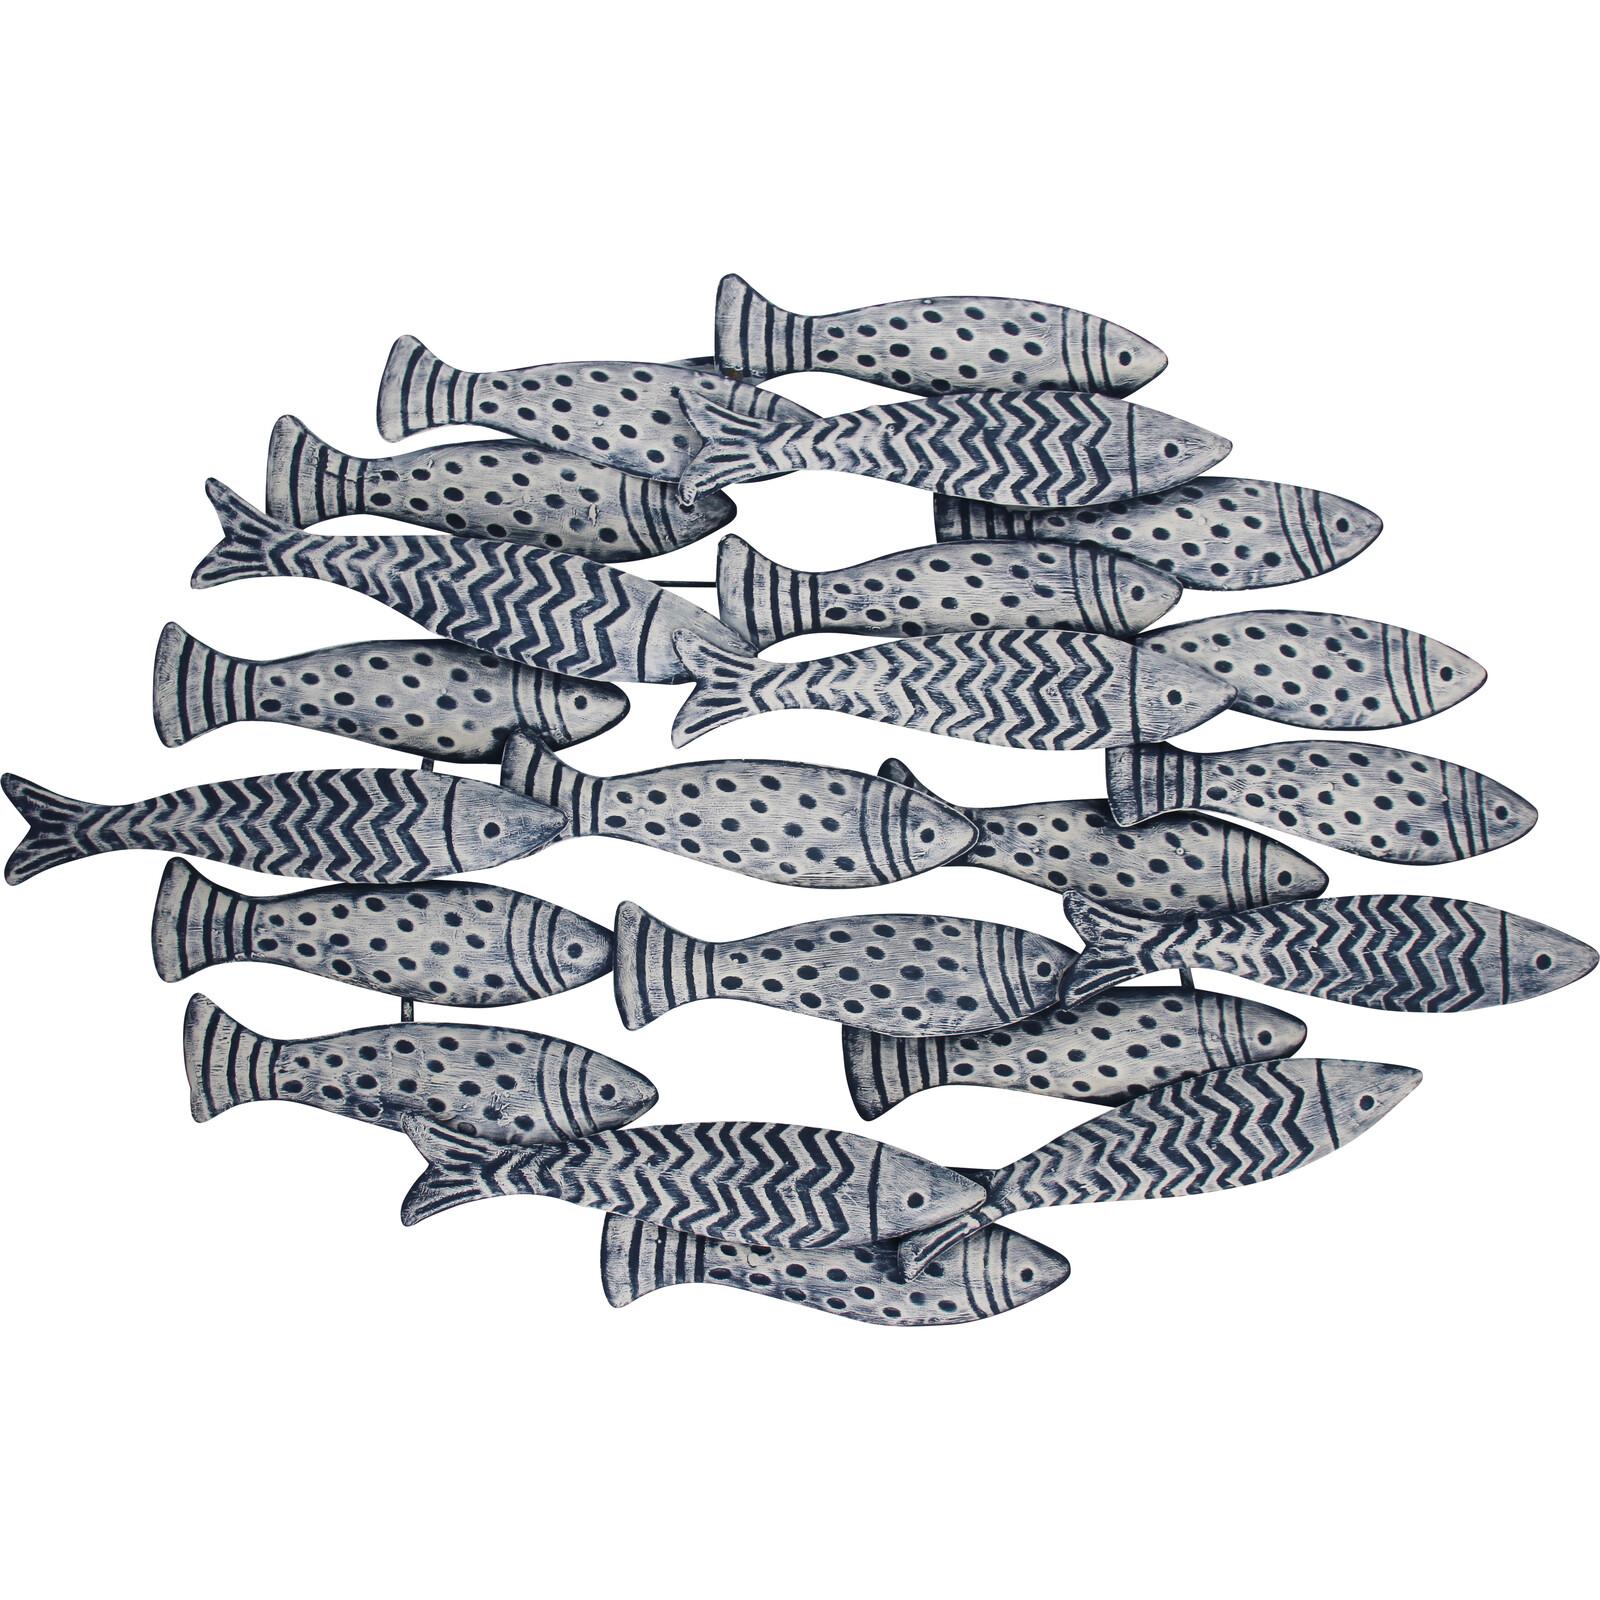 Wall Decor Fish School